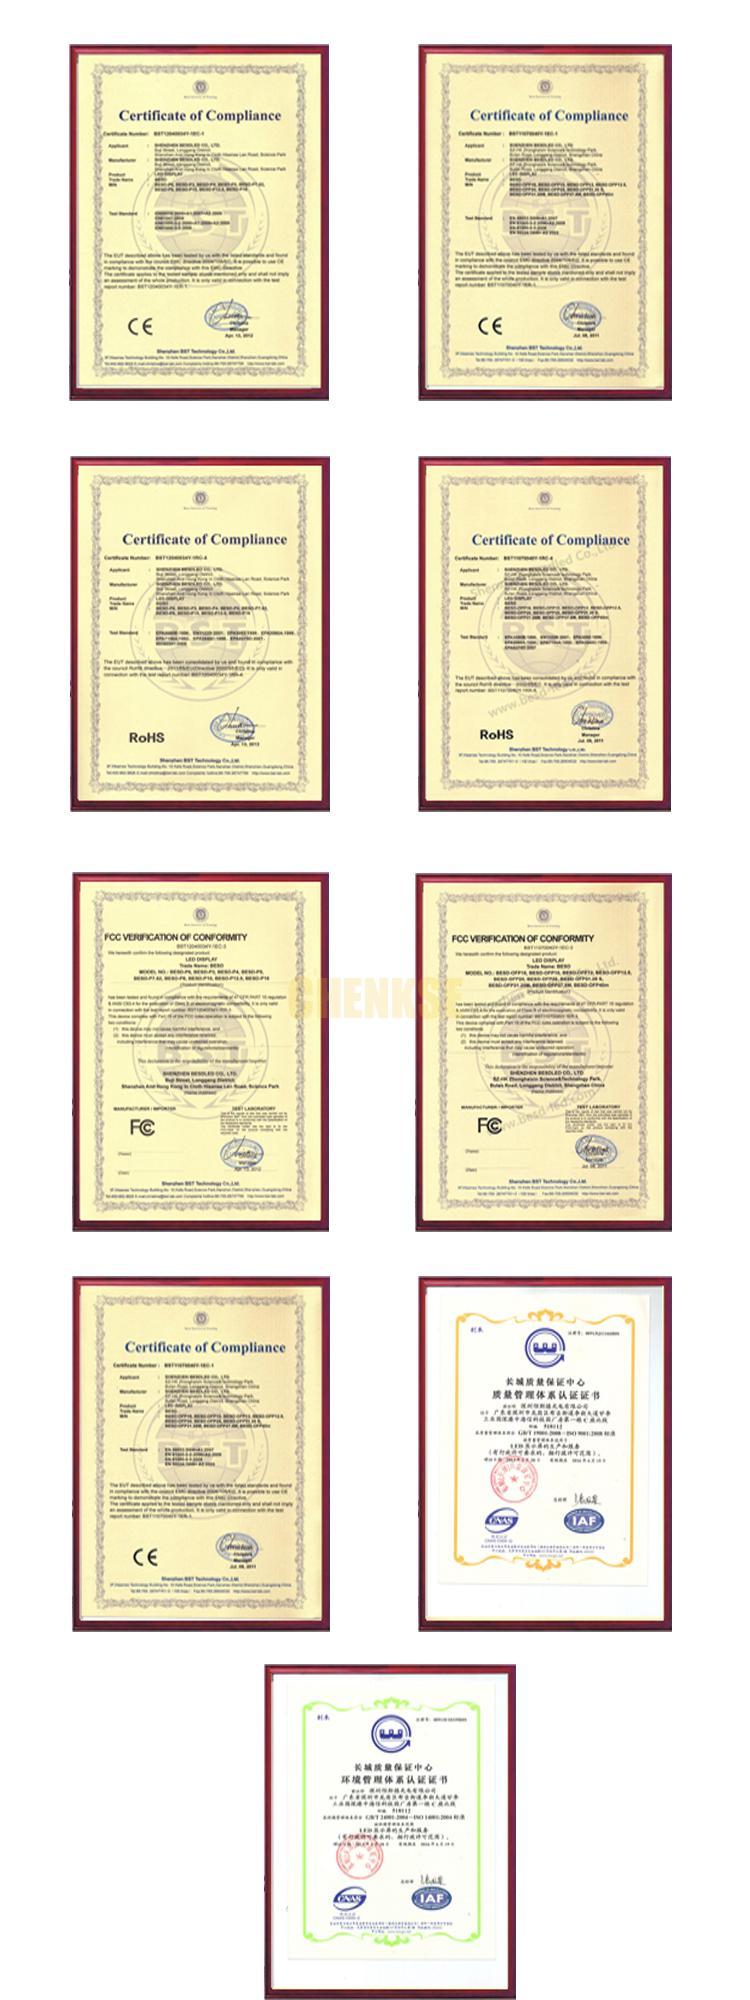 Honors&Certificates